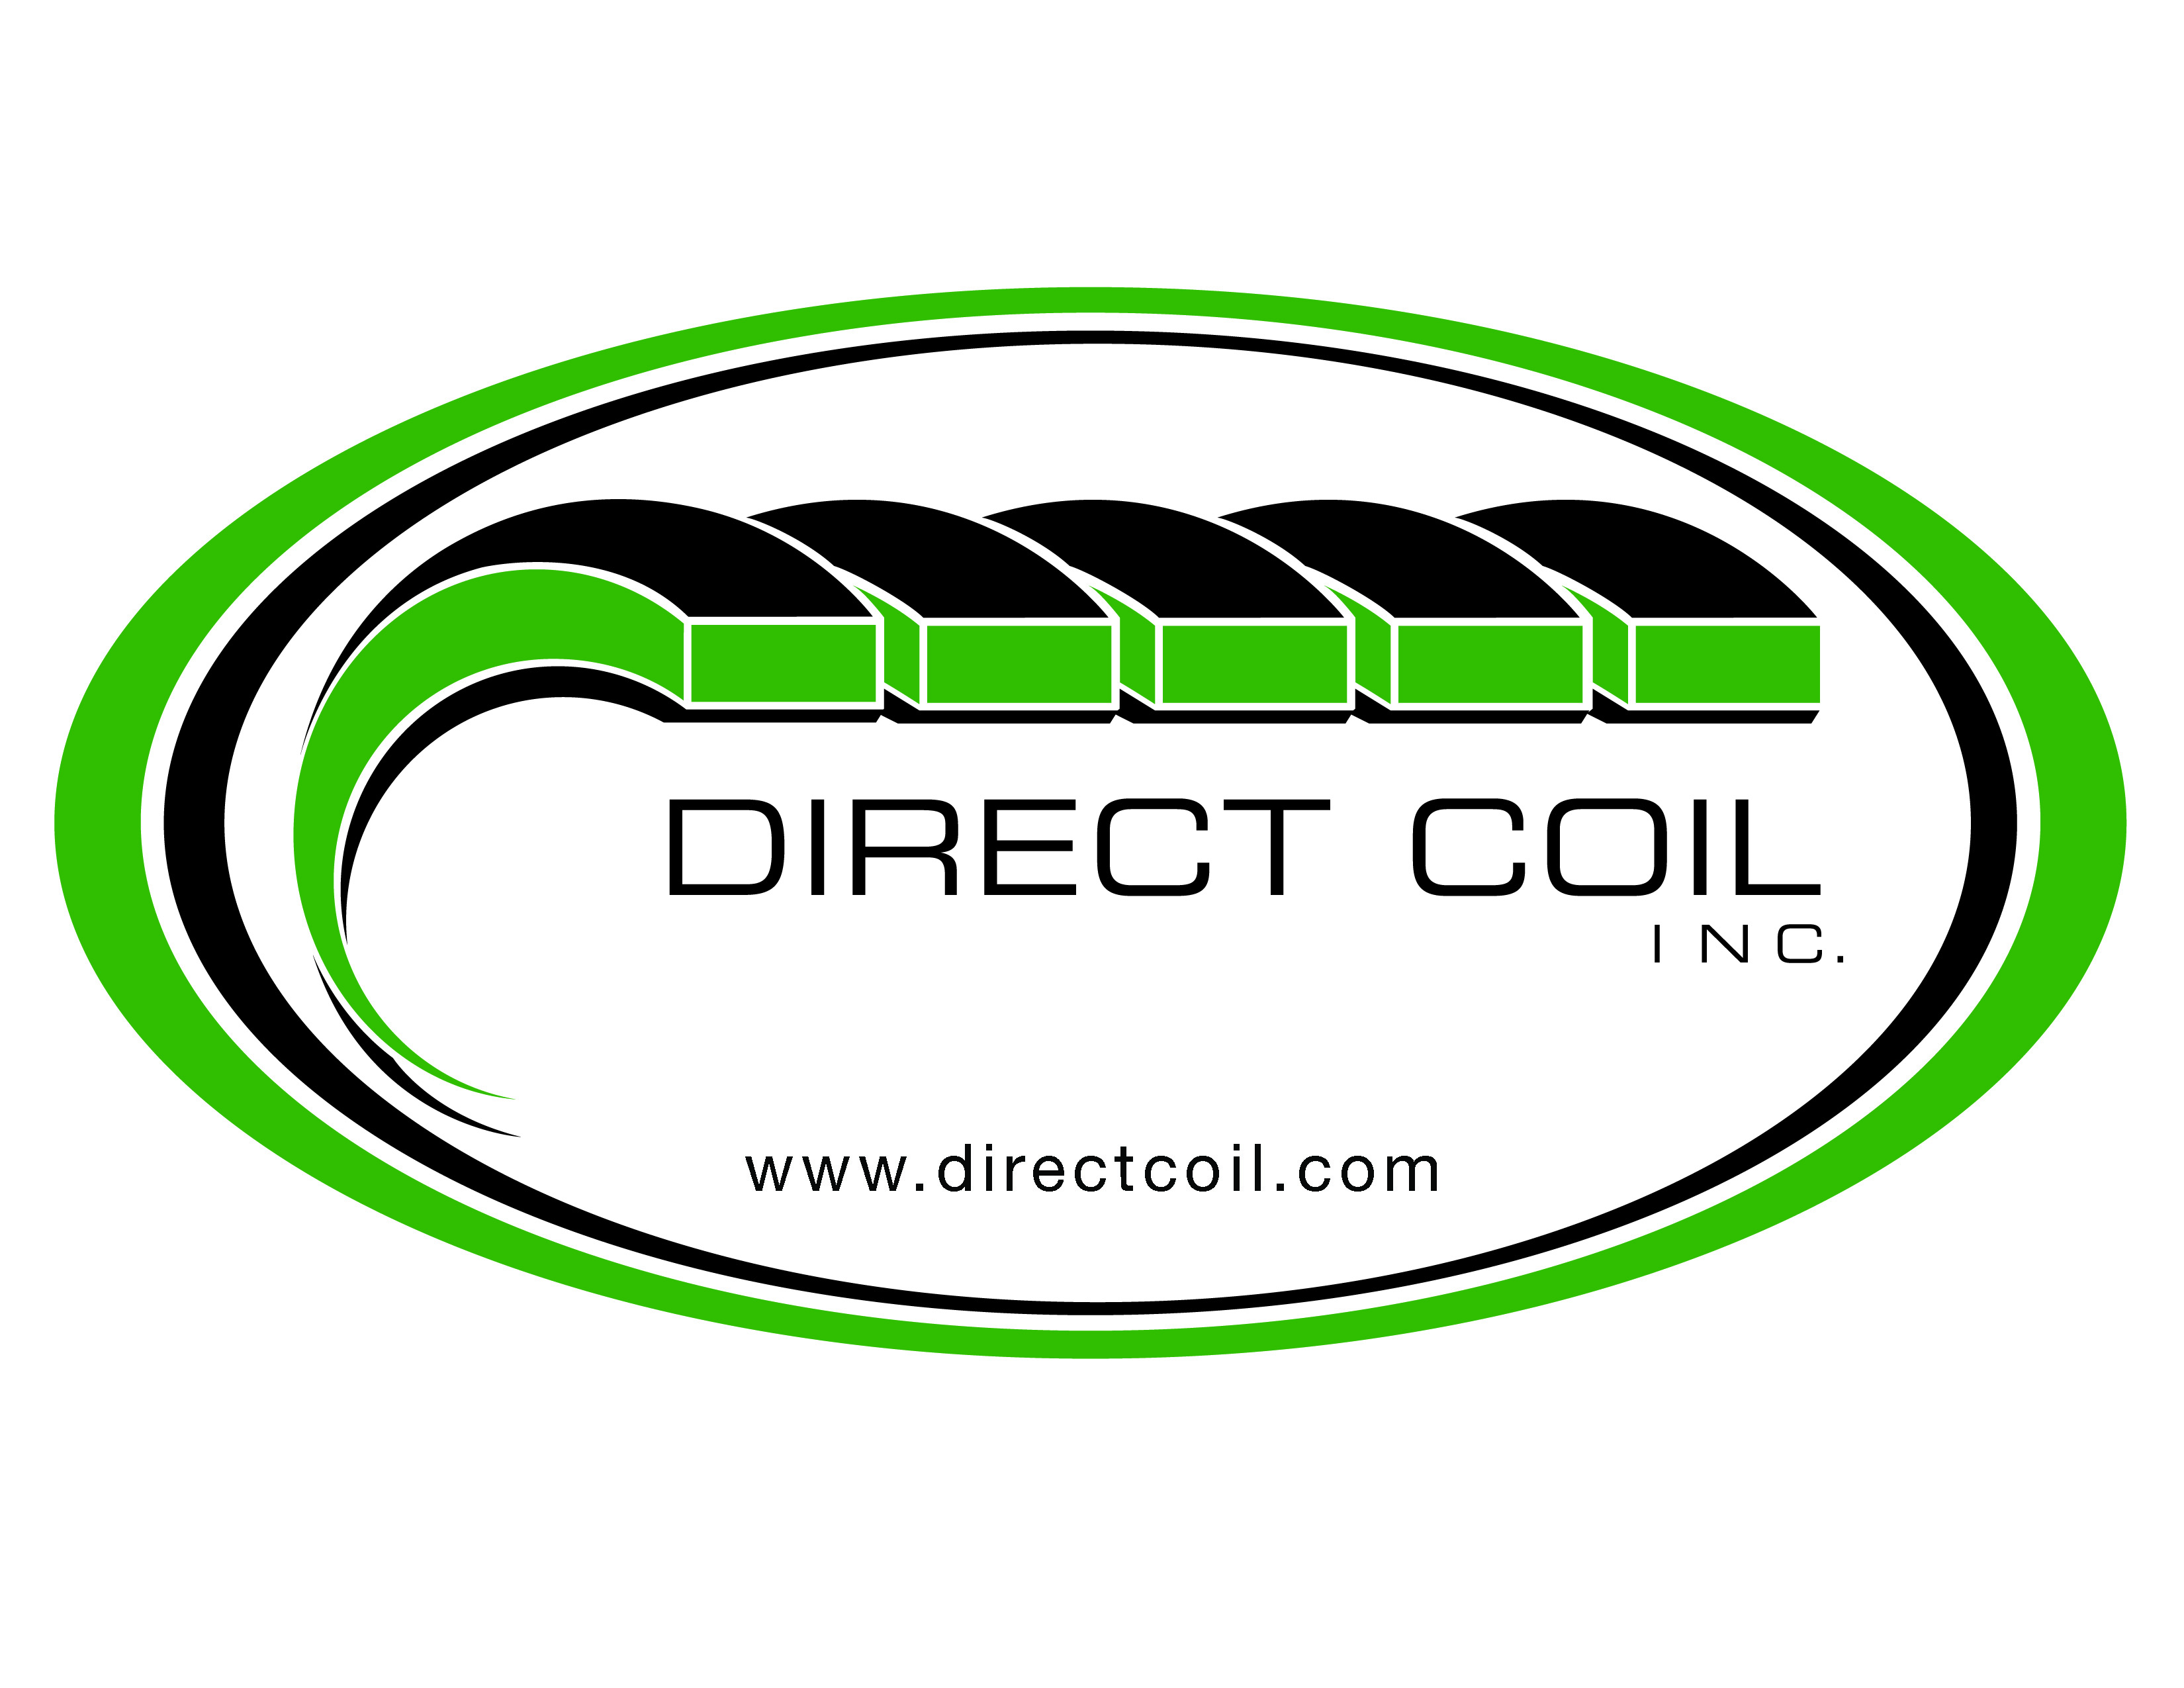 Directcoil